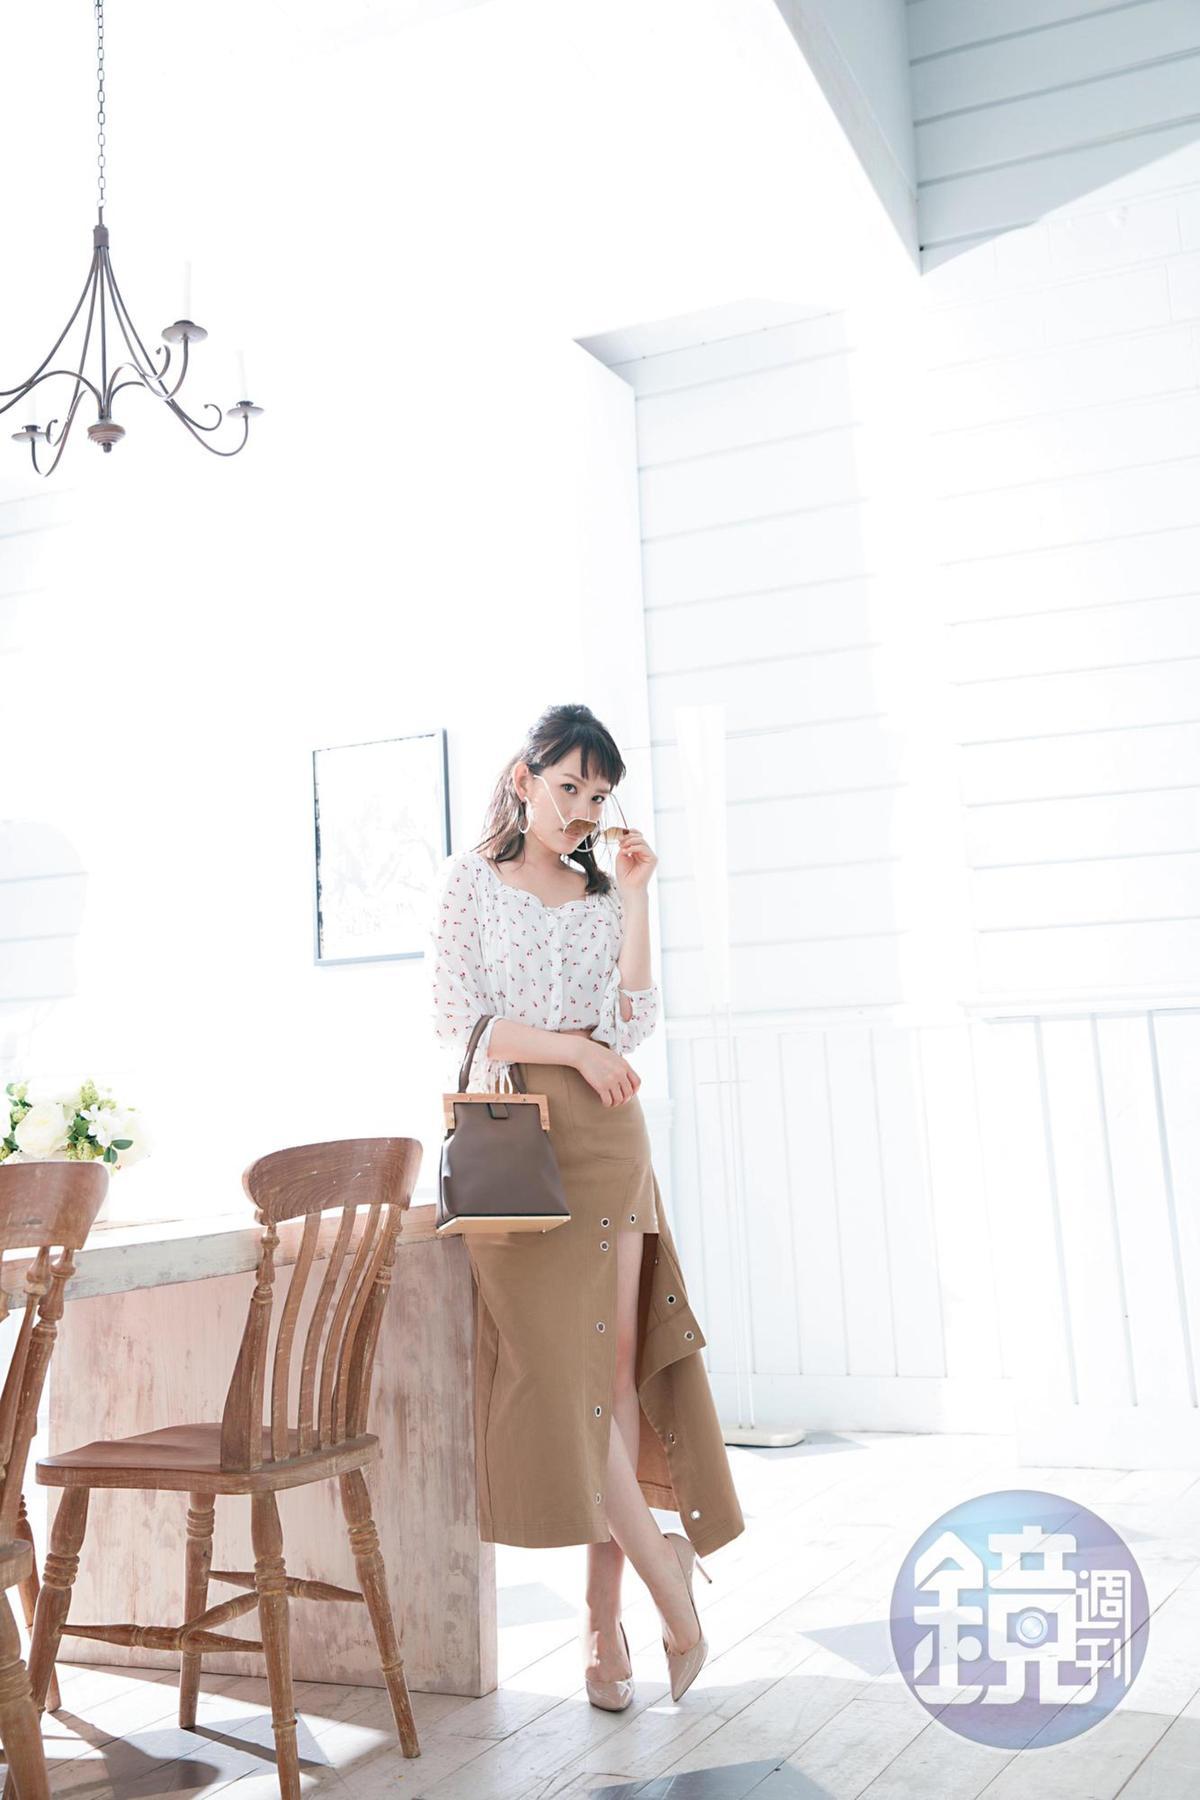 FOREVER21玫瑰花襯衫。約NT$550;東區小店買的木頭框手提包。NT$1,780;東區小店買的卡其長裙。約NT$4,700;CESARE CASADEI粉膚色高跟鞋。約NT$10,000